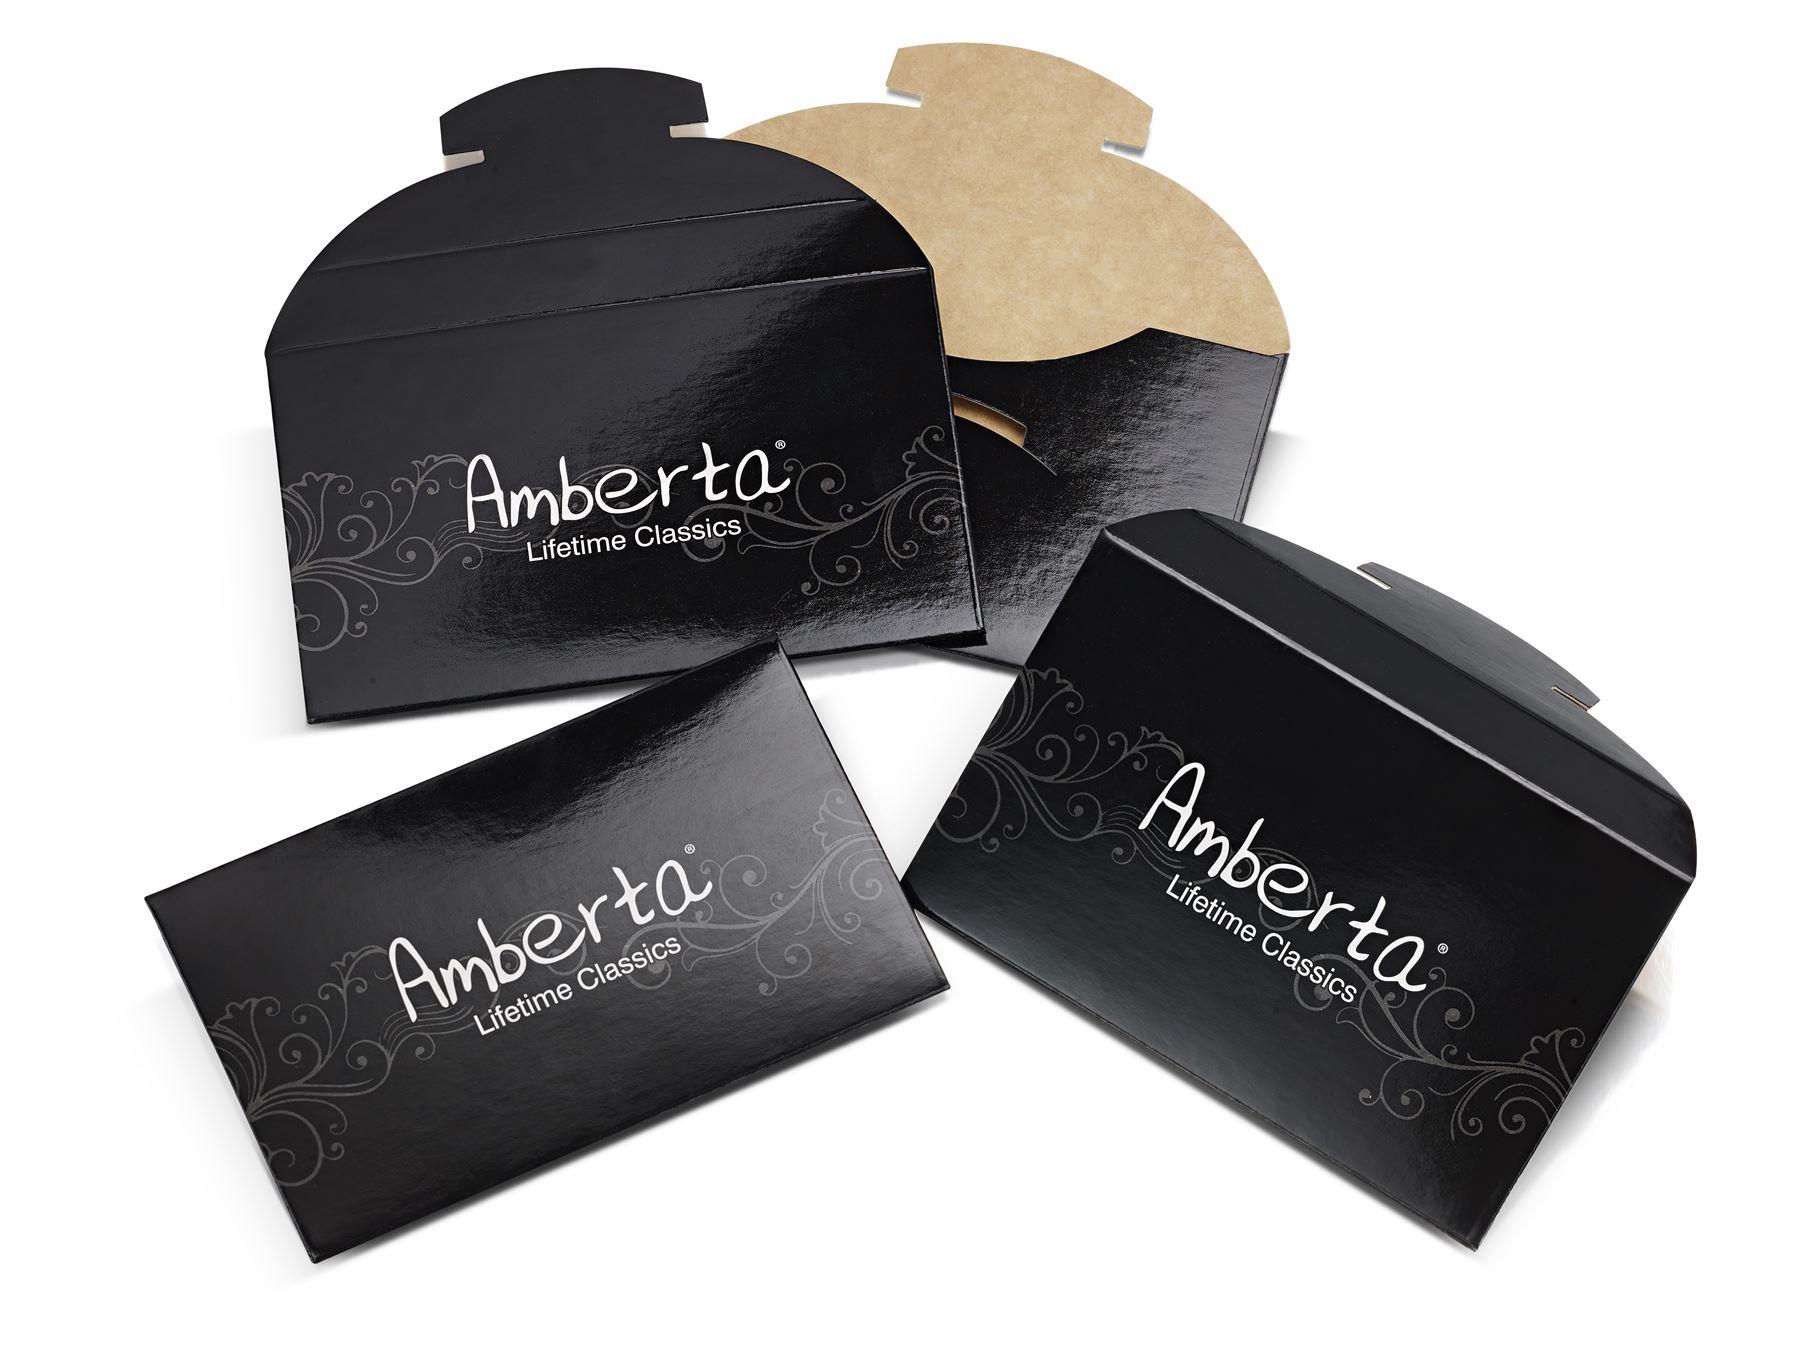 Amberta-Anillo-para-Pies-en-Plata-de-Ley-925-Anillo-Midi-Ajustable-para-Mujer miniatura 7